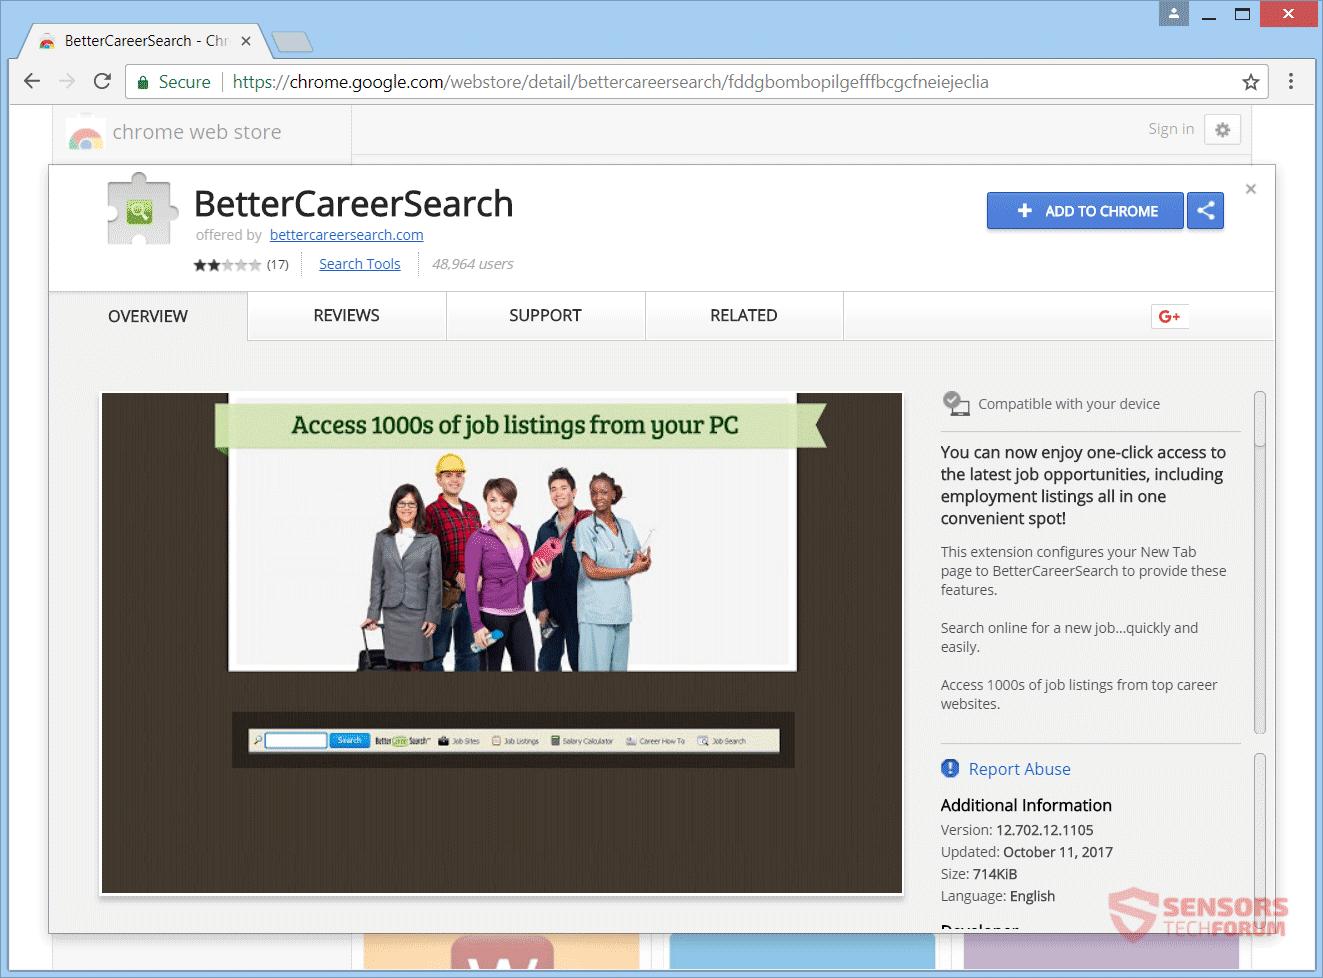 Edge browser hijack - Microsoft Community